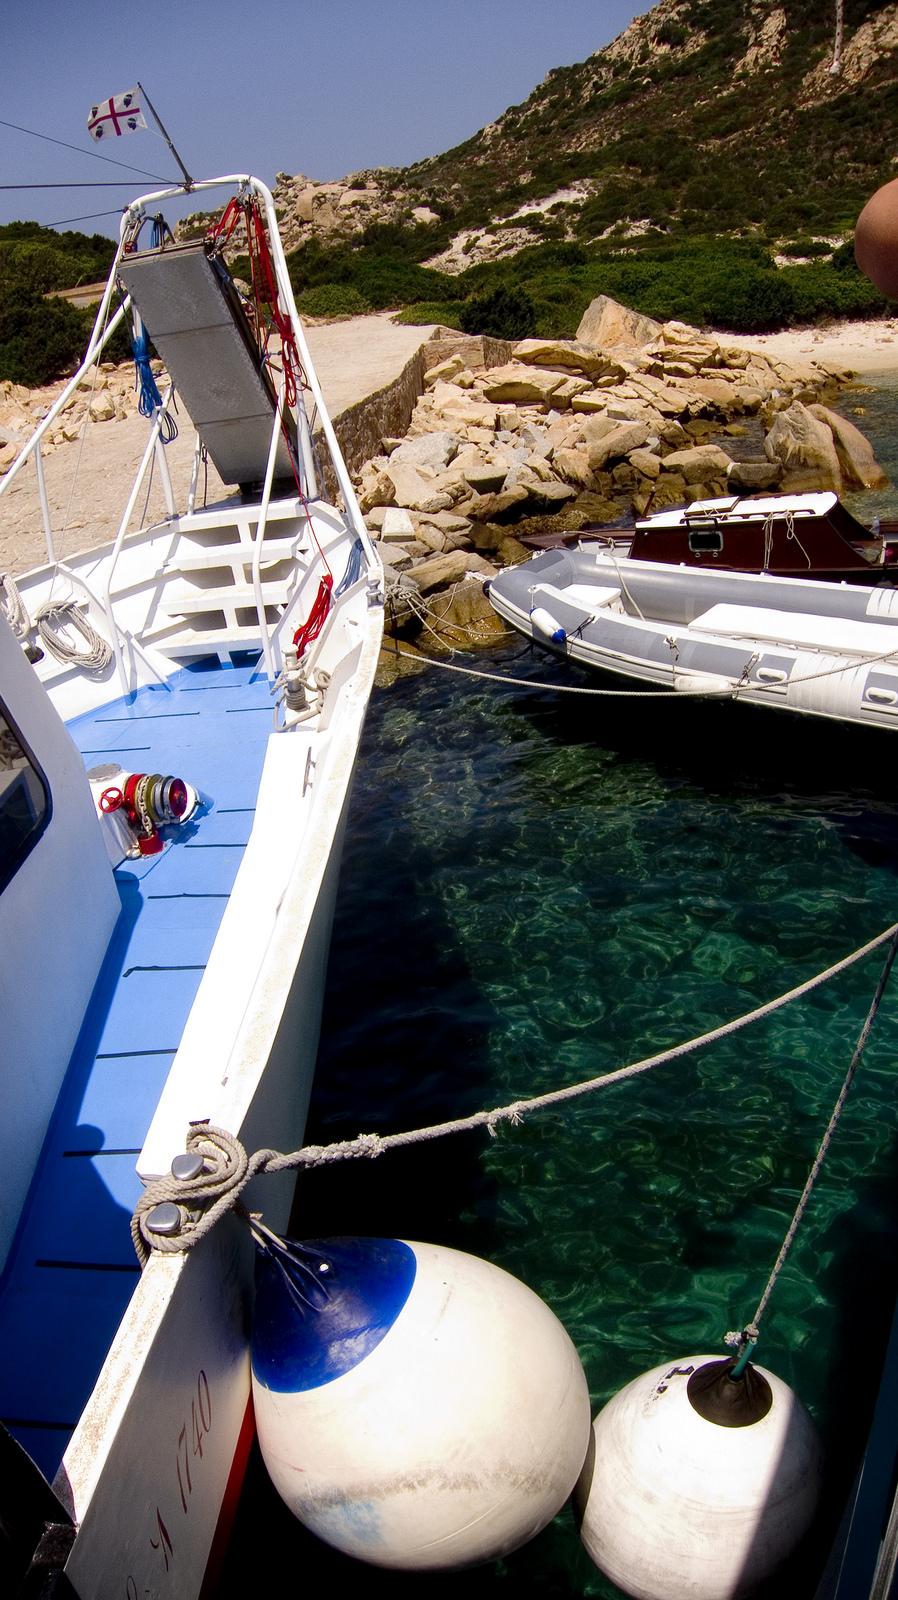 Photos taken in and around Santa Teresa Di Gallura and Alghero in Summer 2013